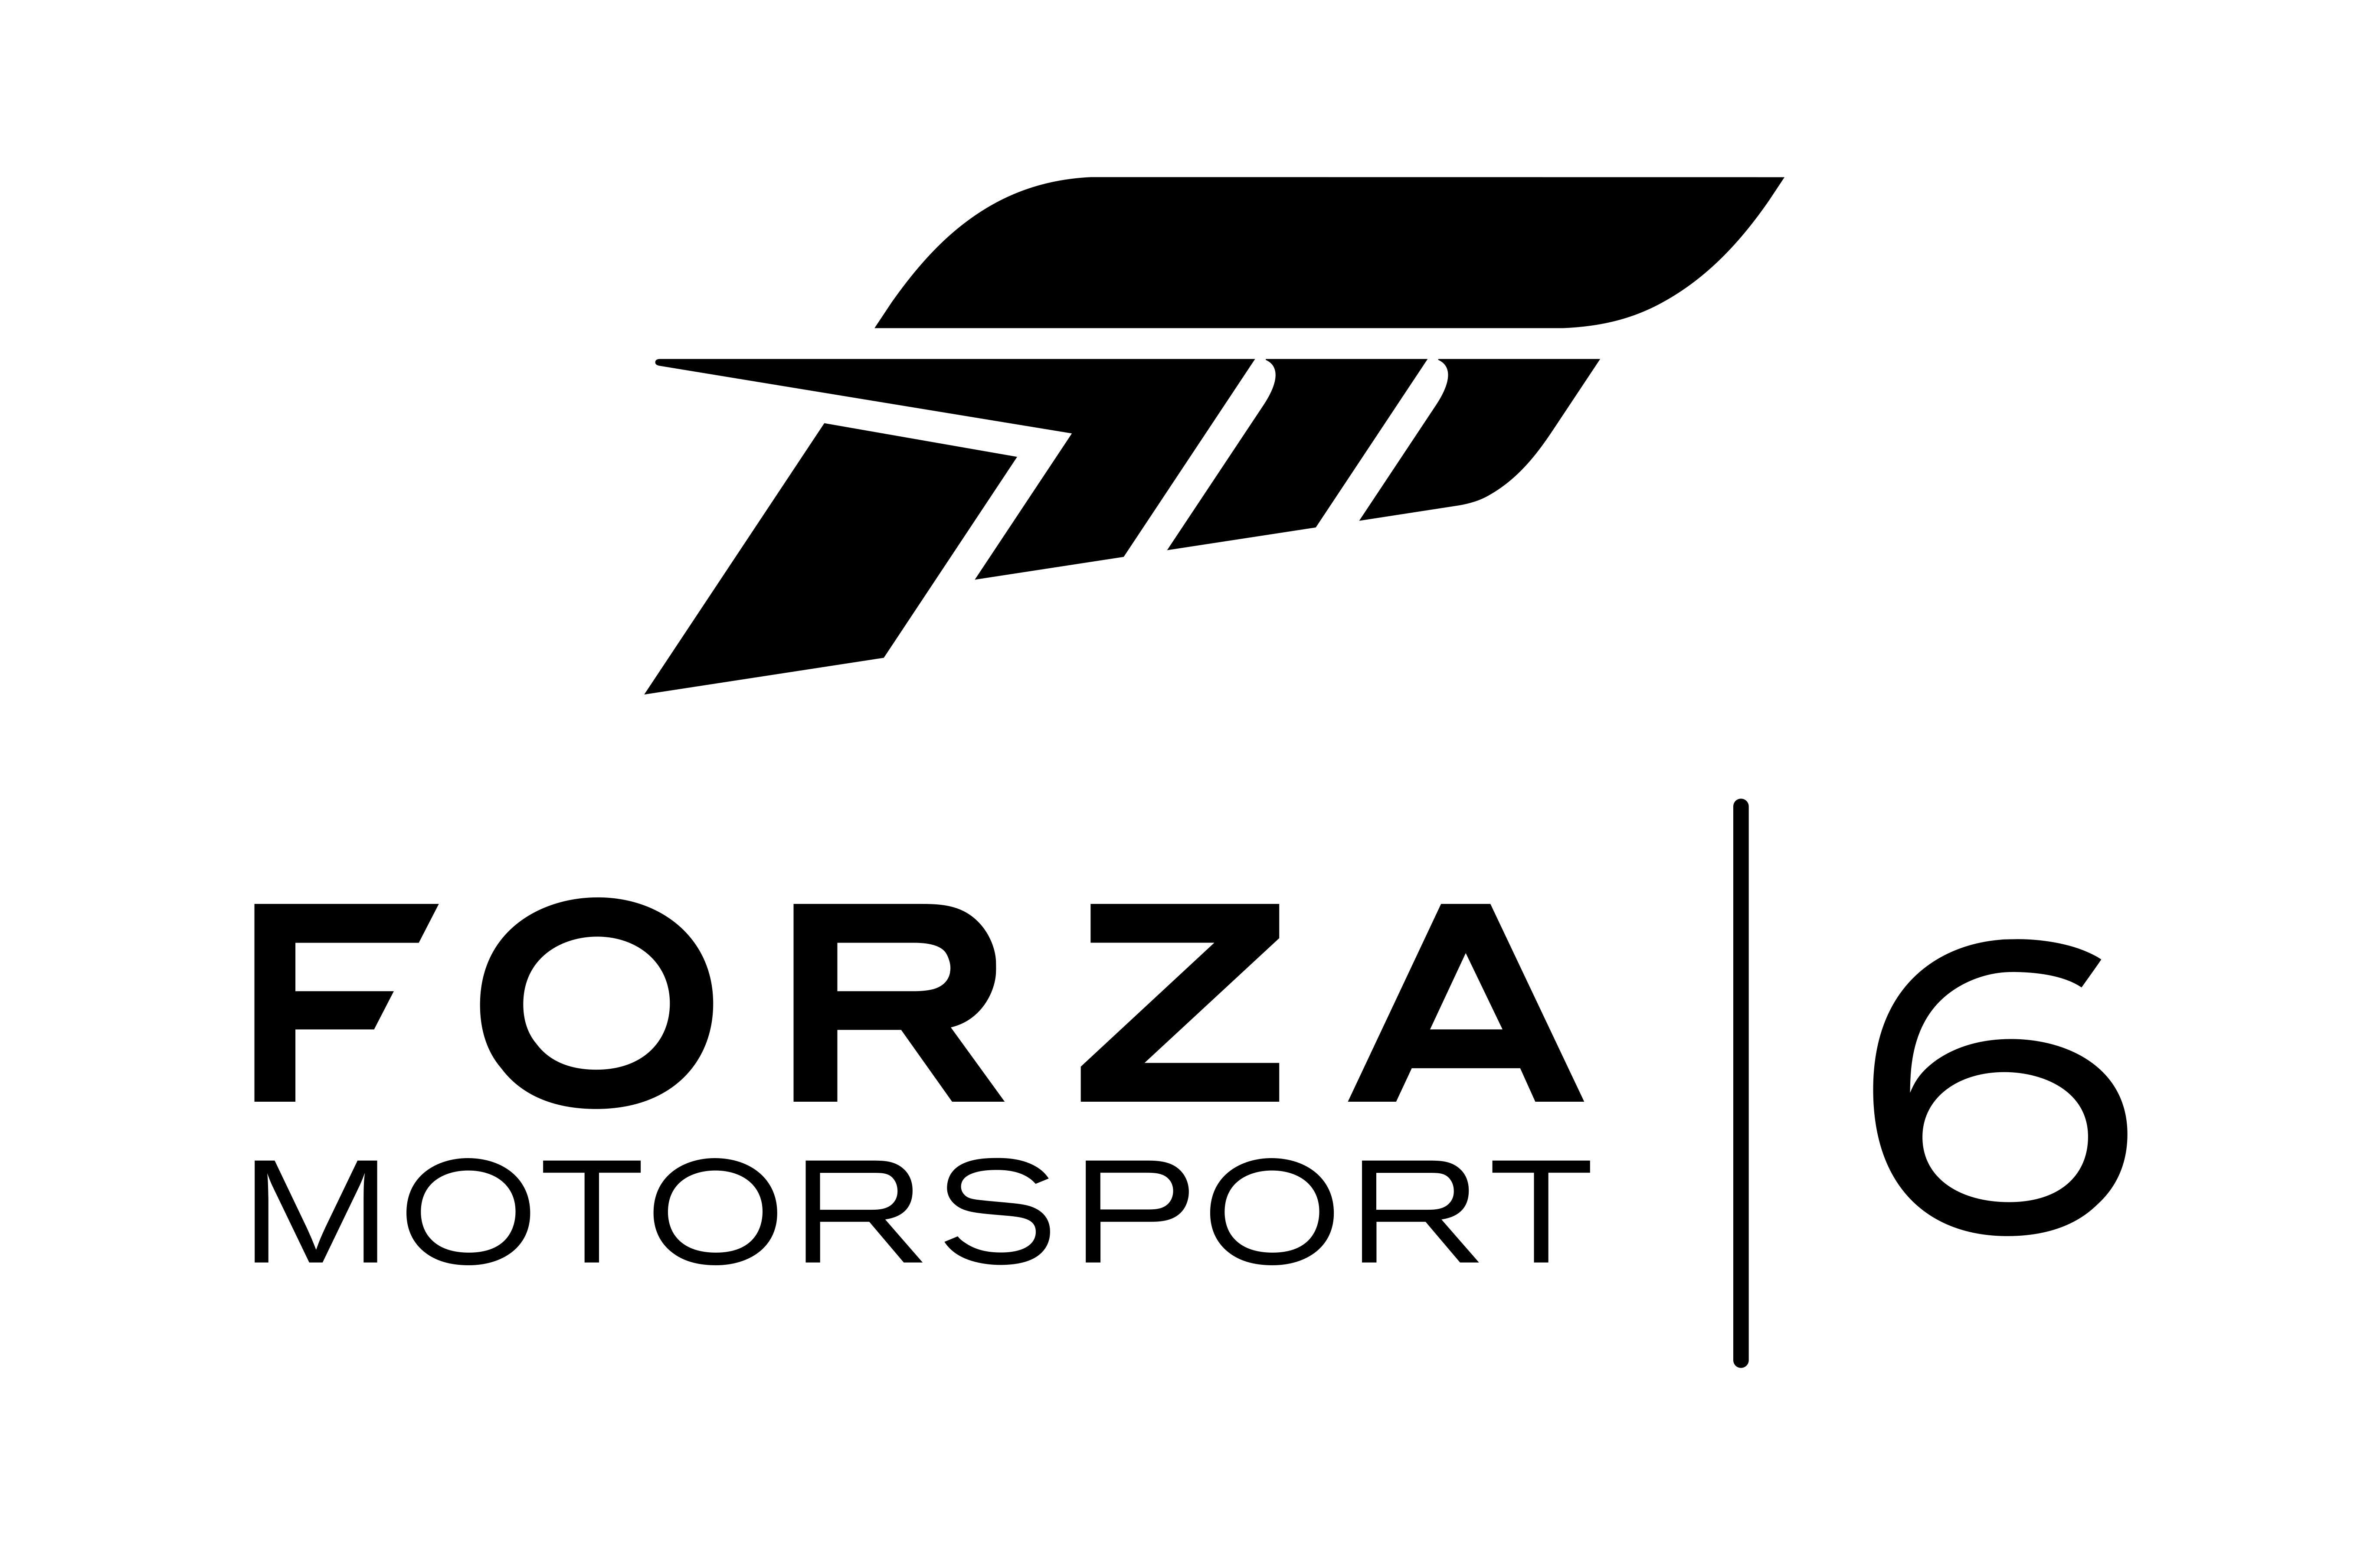 forza motorsport 6 announced